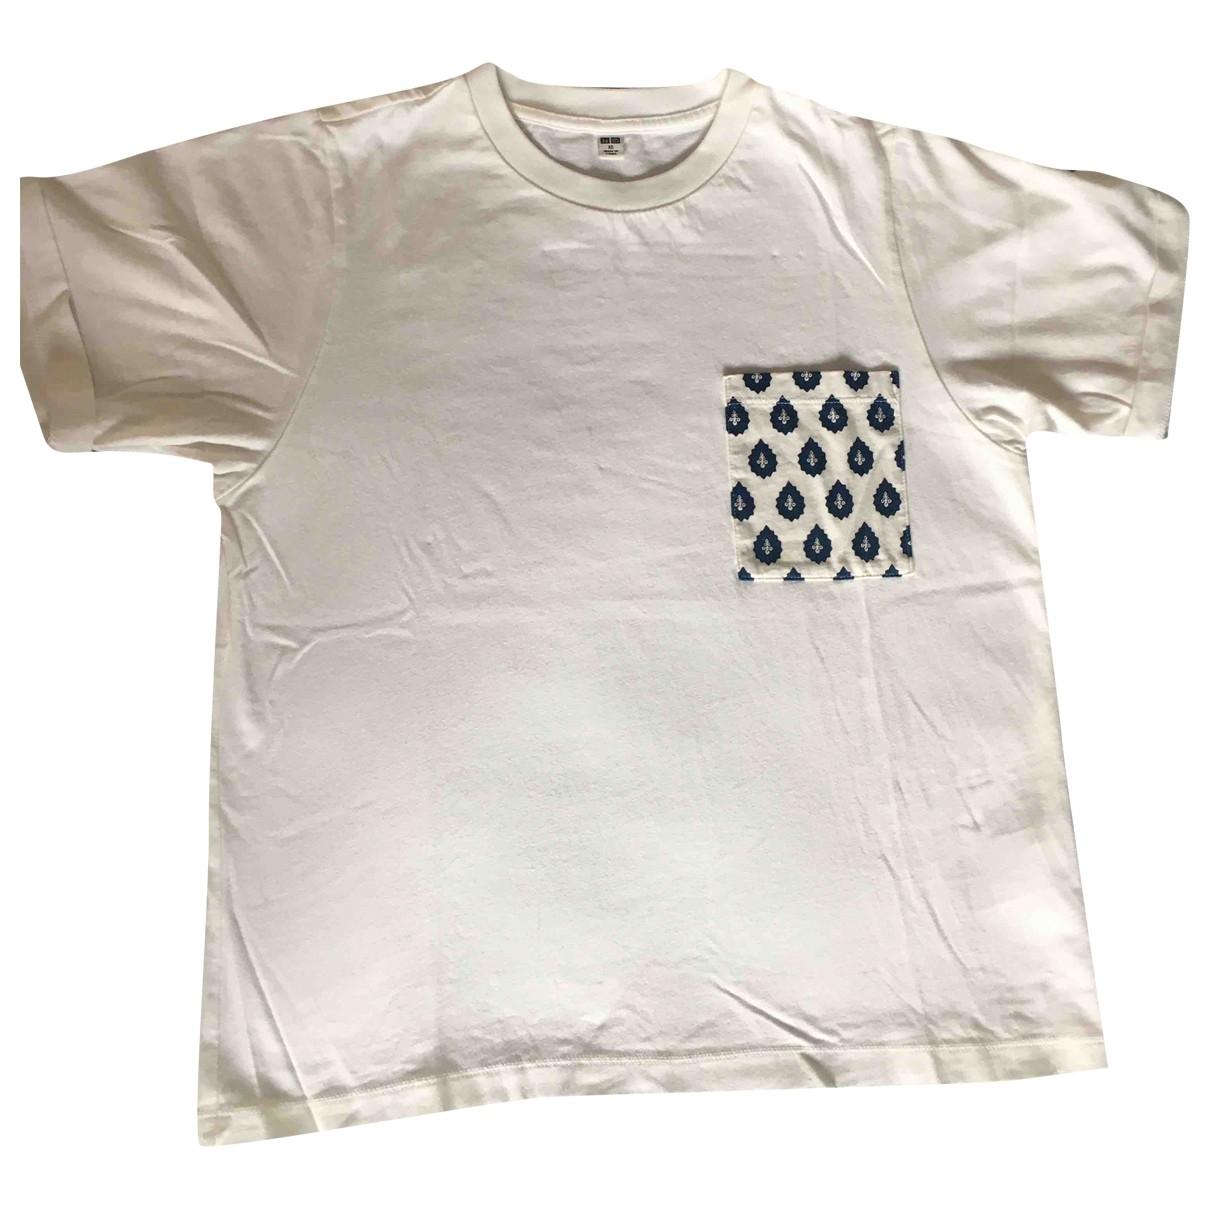 Uniqlo \N White Cotton  top for Women XS International